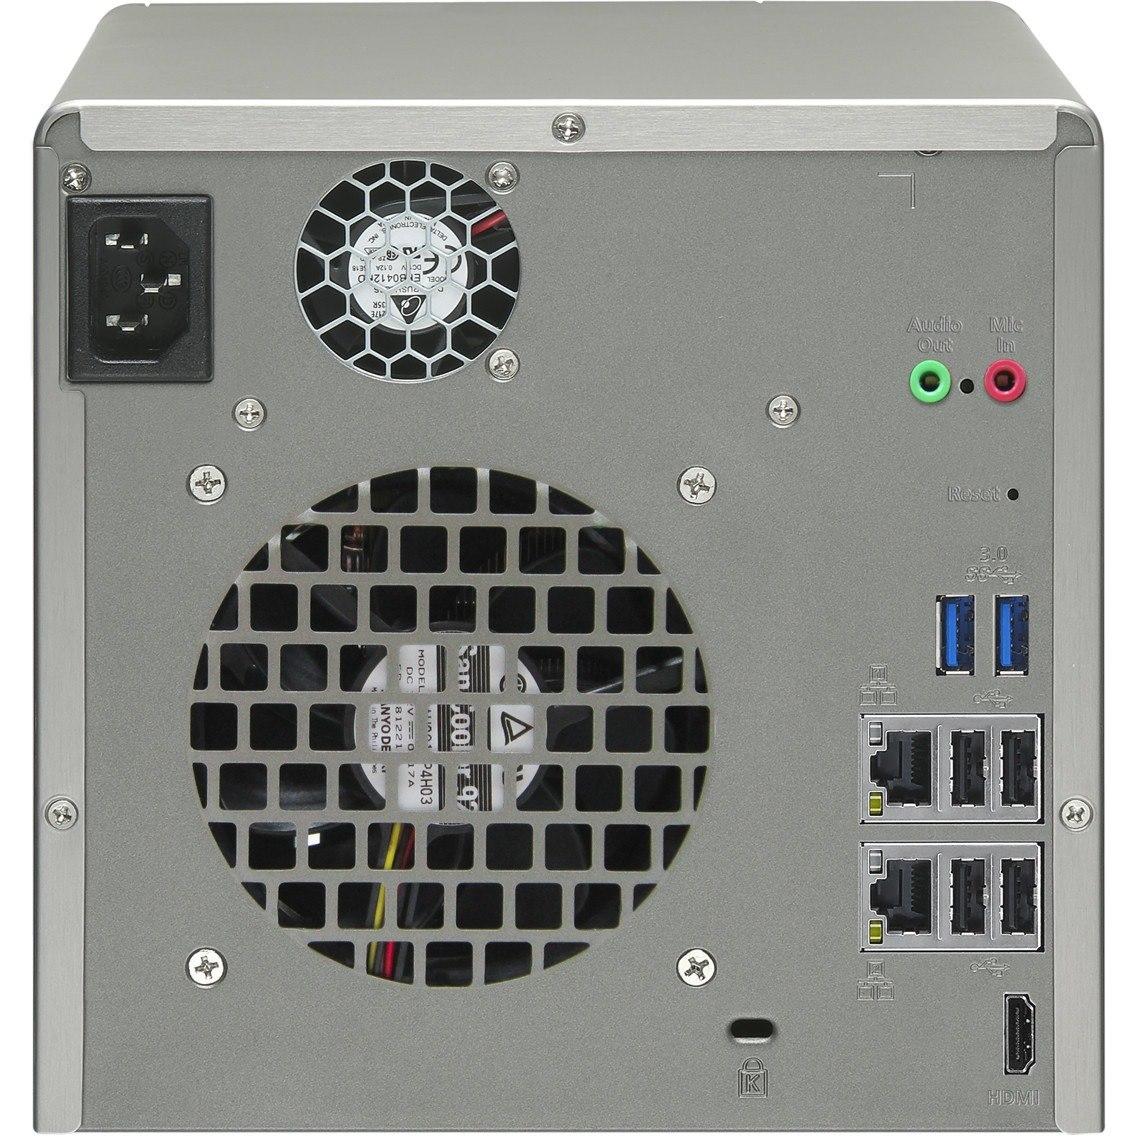 QNAP VioStor VS-4116 Pro+ Video Surveillance Station